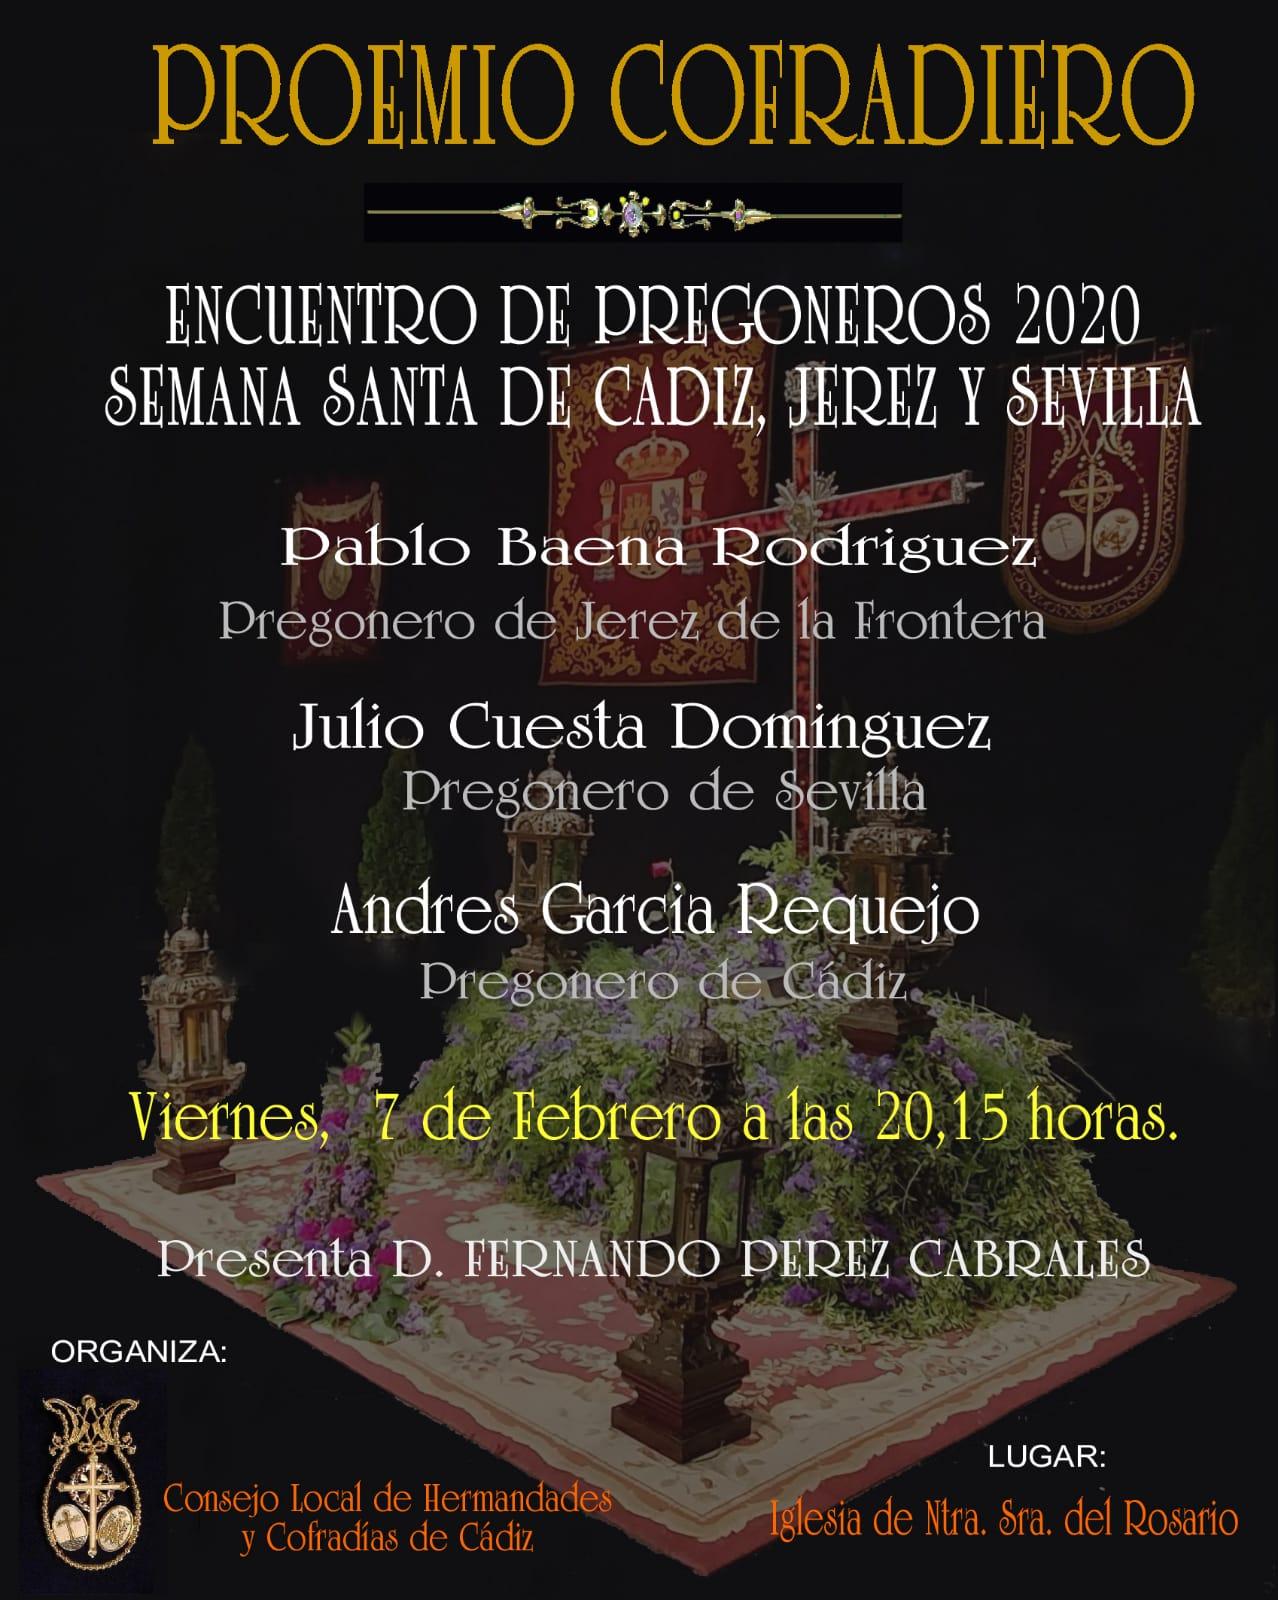 Proemio cofradiero entre los pregoneros de Sevilla, Cádiz y Jerez